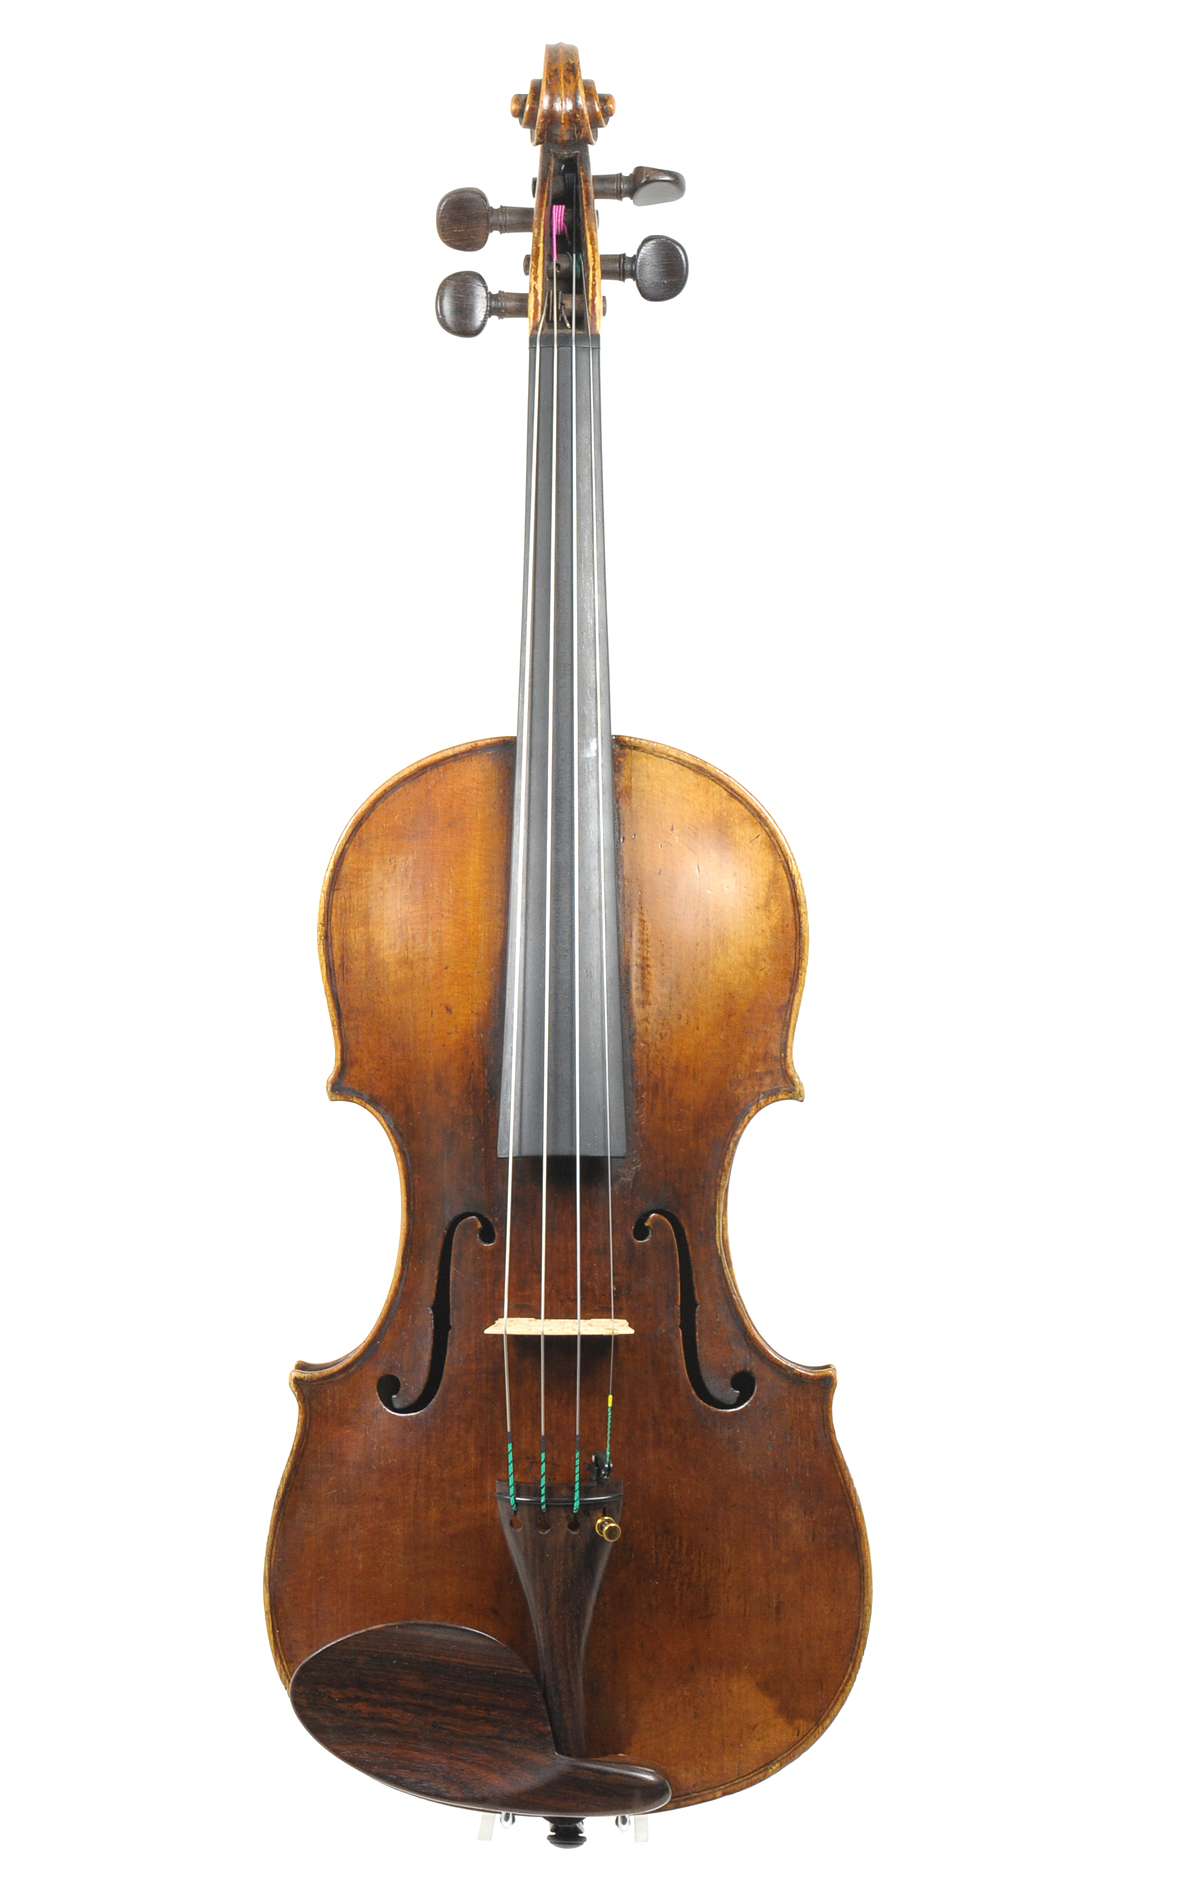 Rare violin by matthias hornsteiner ii a k a dax Vibeline